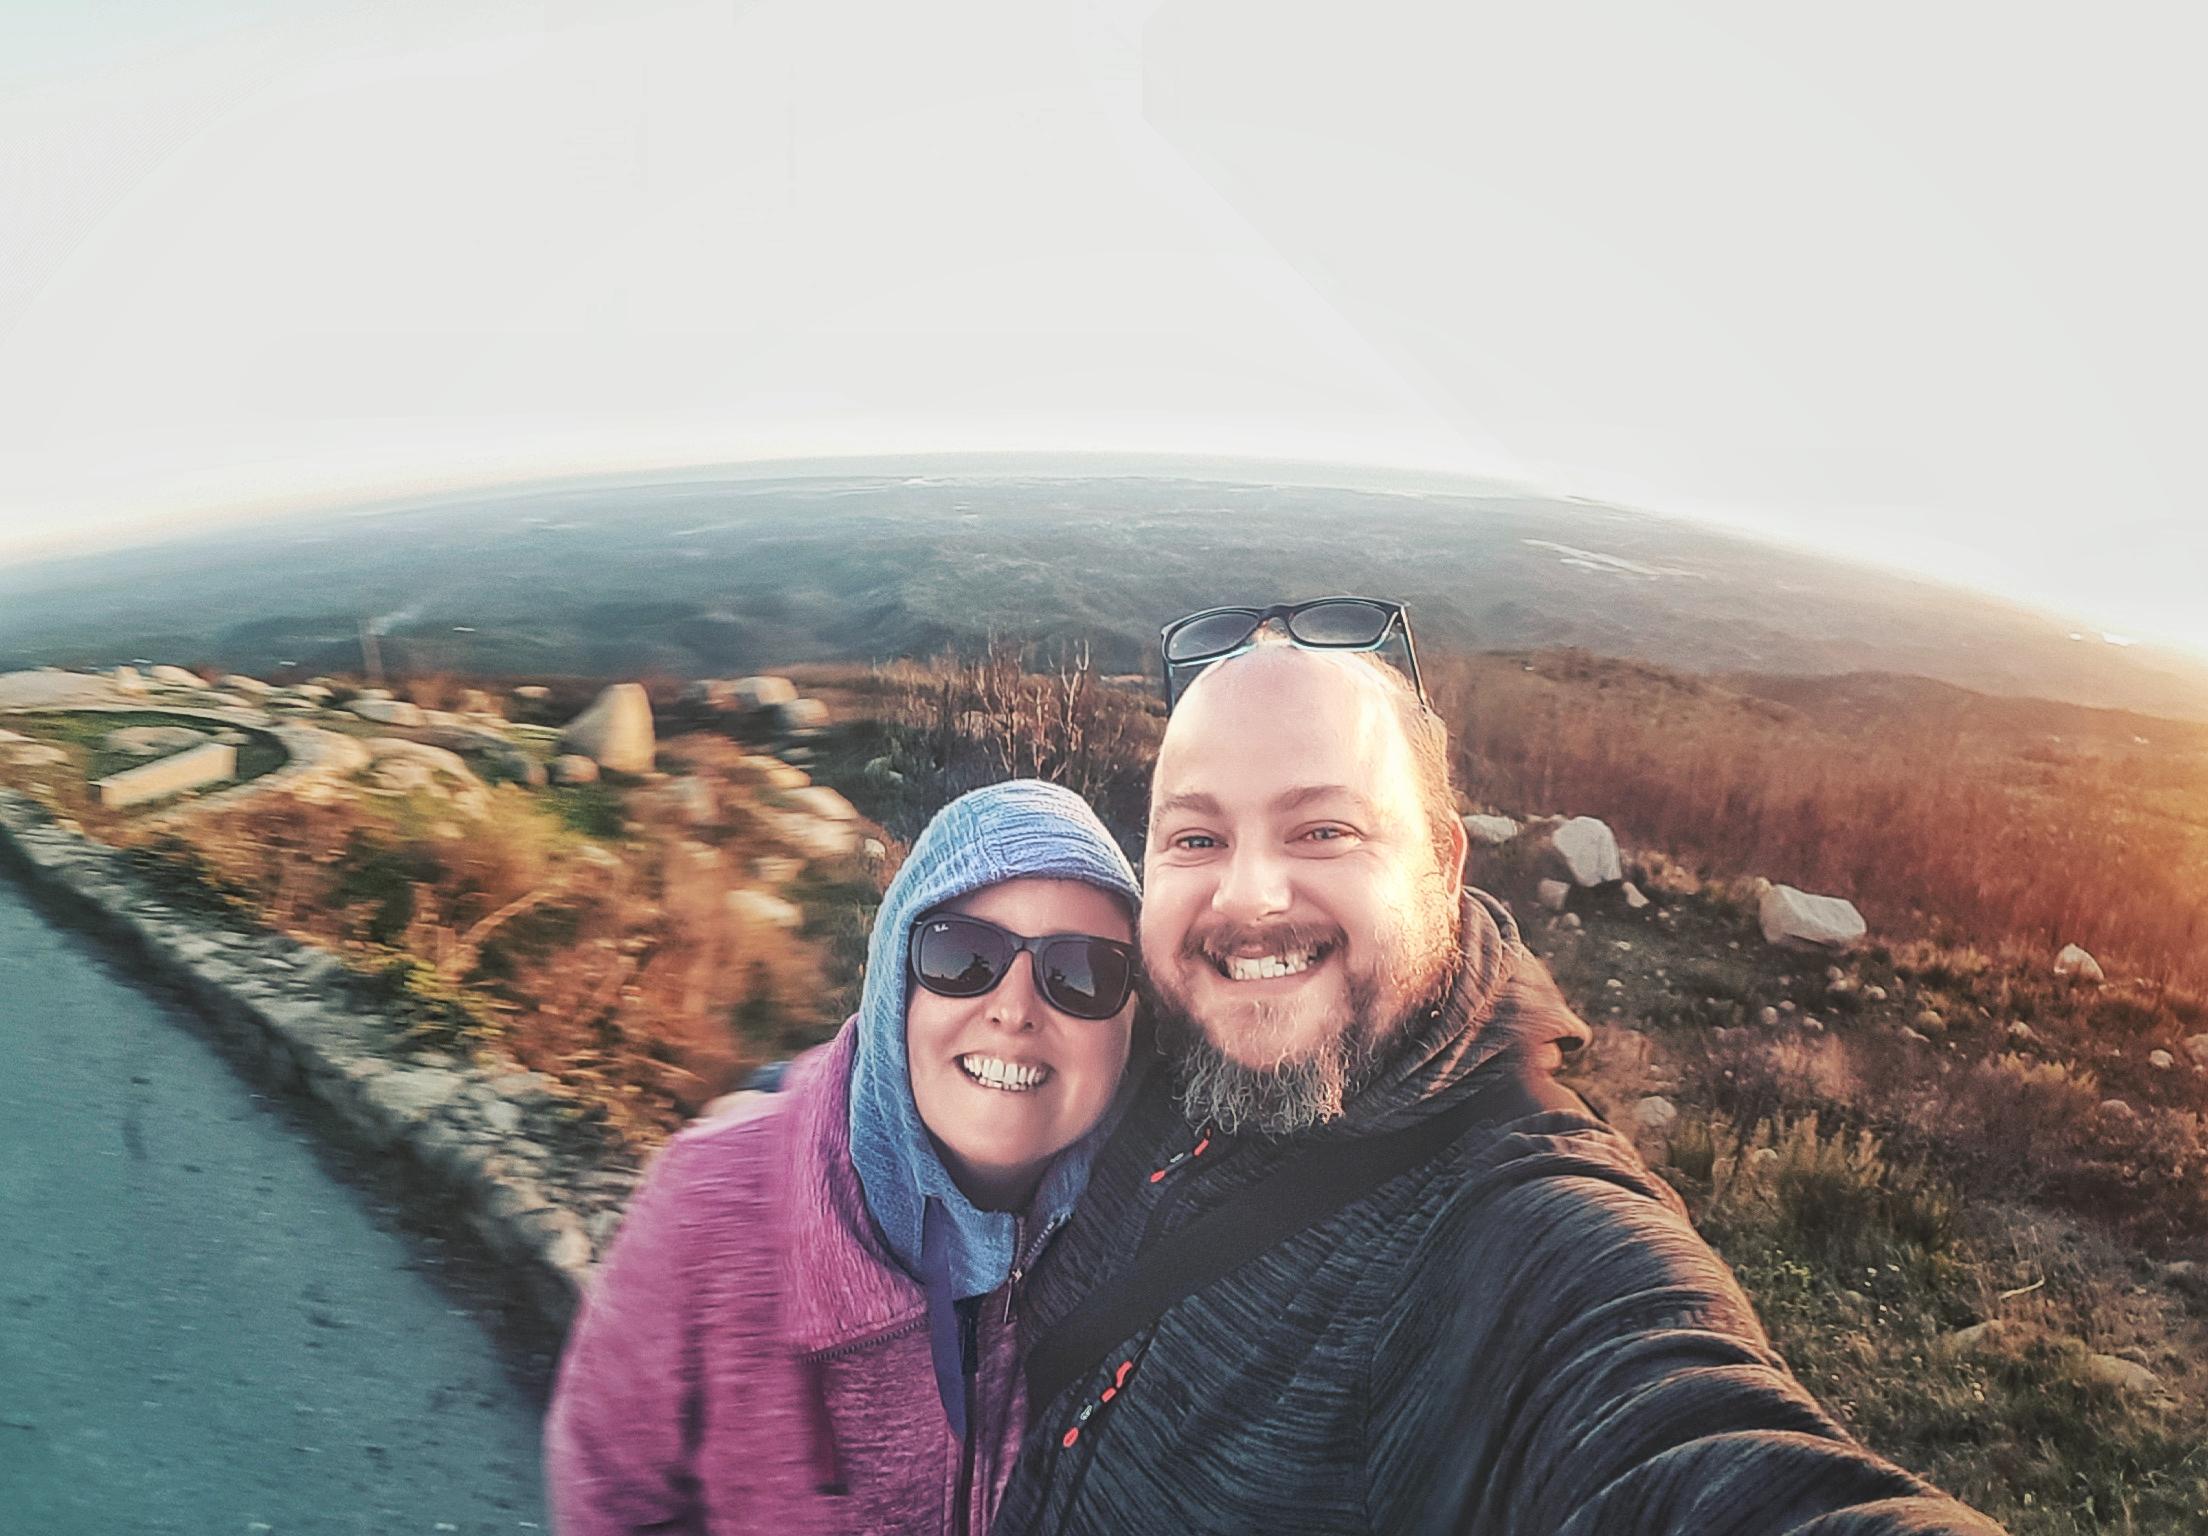 selfie at the top of the mountain. happy couple. golden light. samsung selfie. wide selfie..jpeg